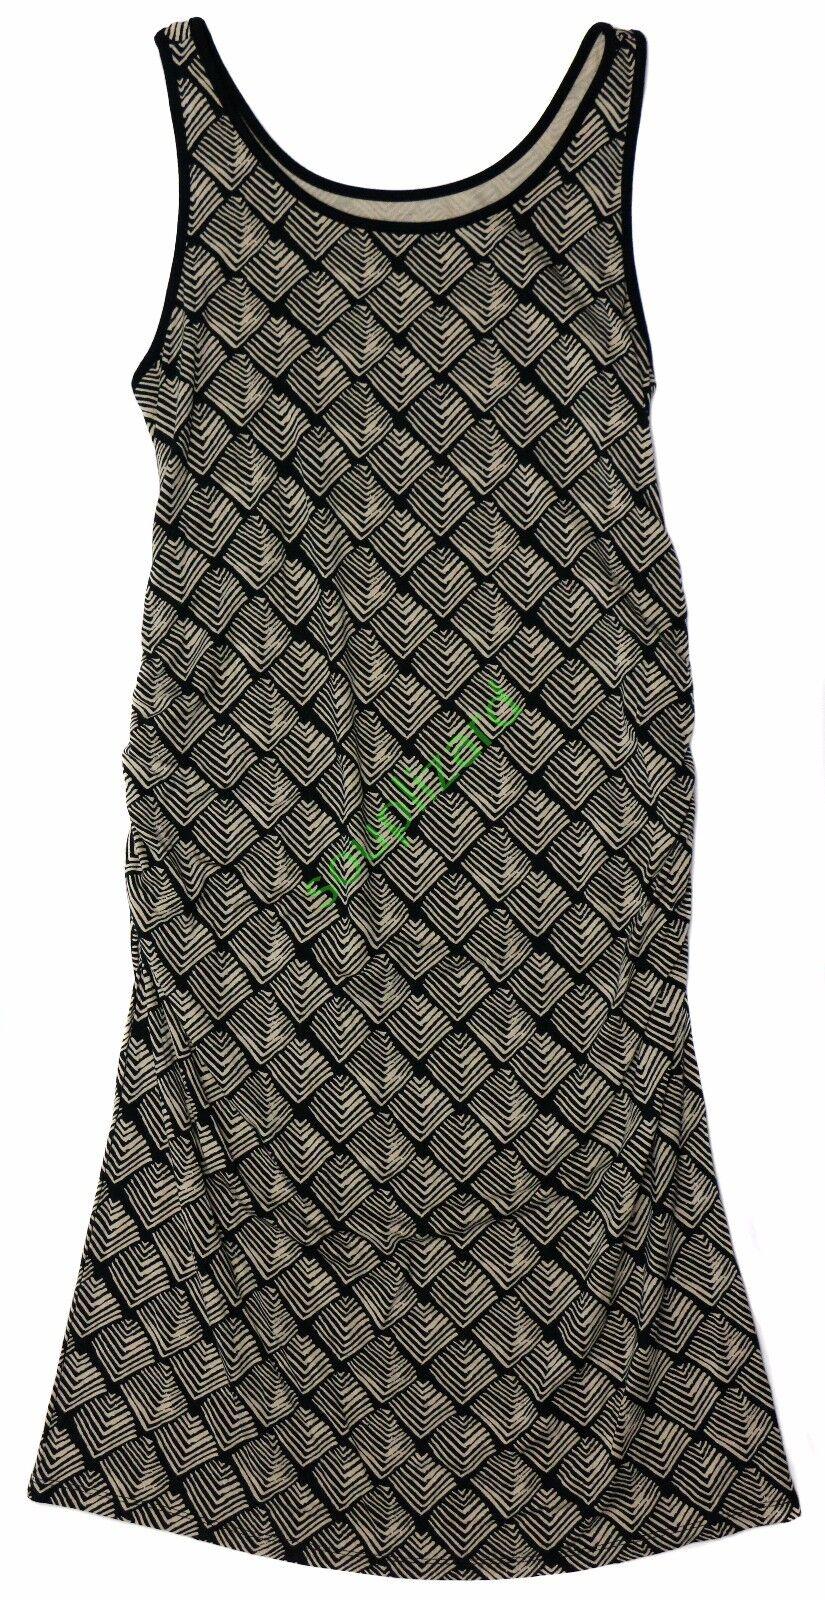 Liz lange maternity dress black tan rayon spandex medium ebay picture 1 of 6 ombrellifo Image collections